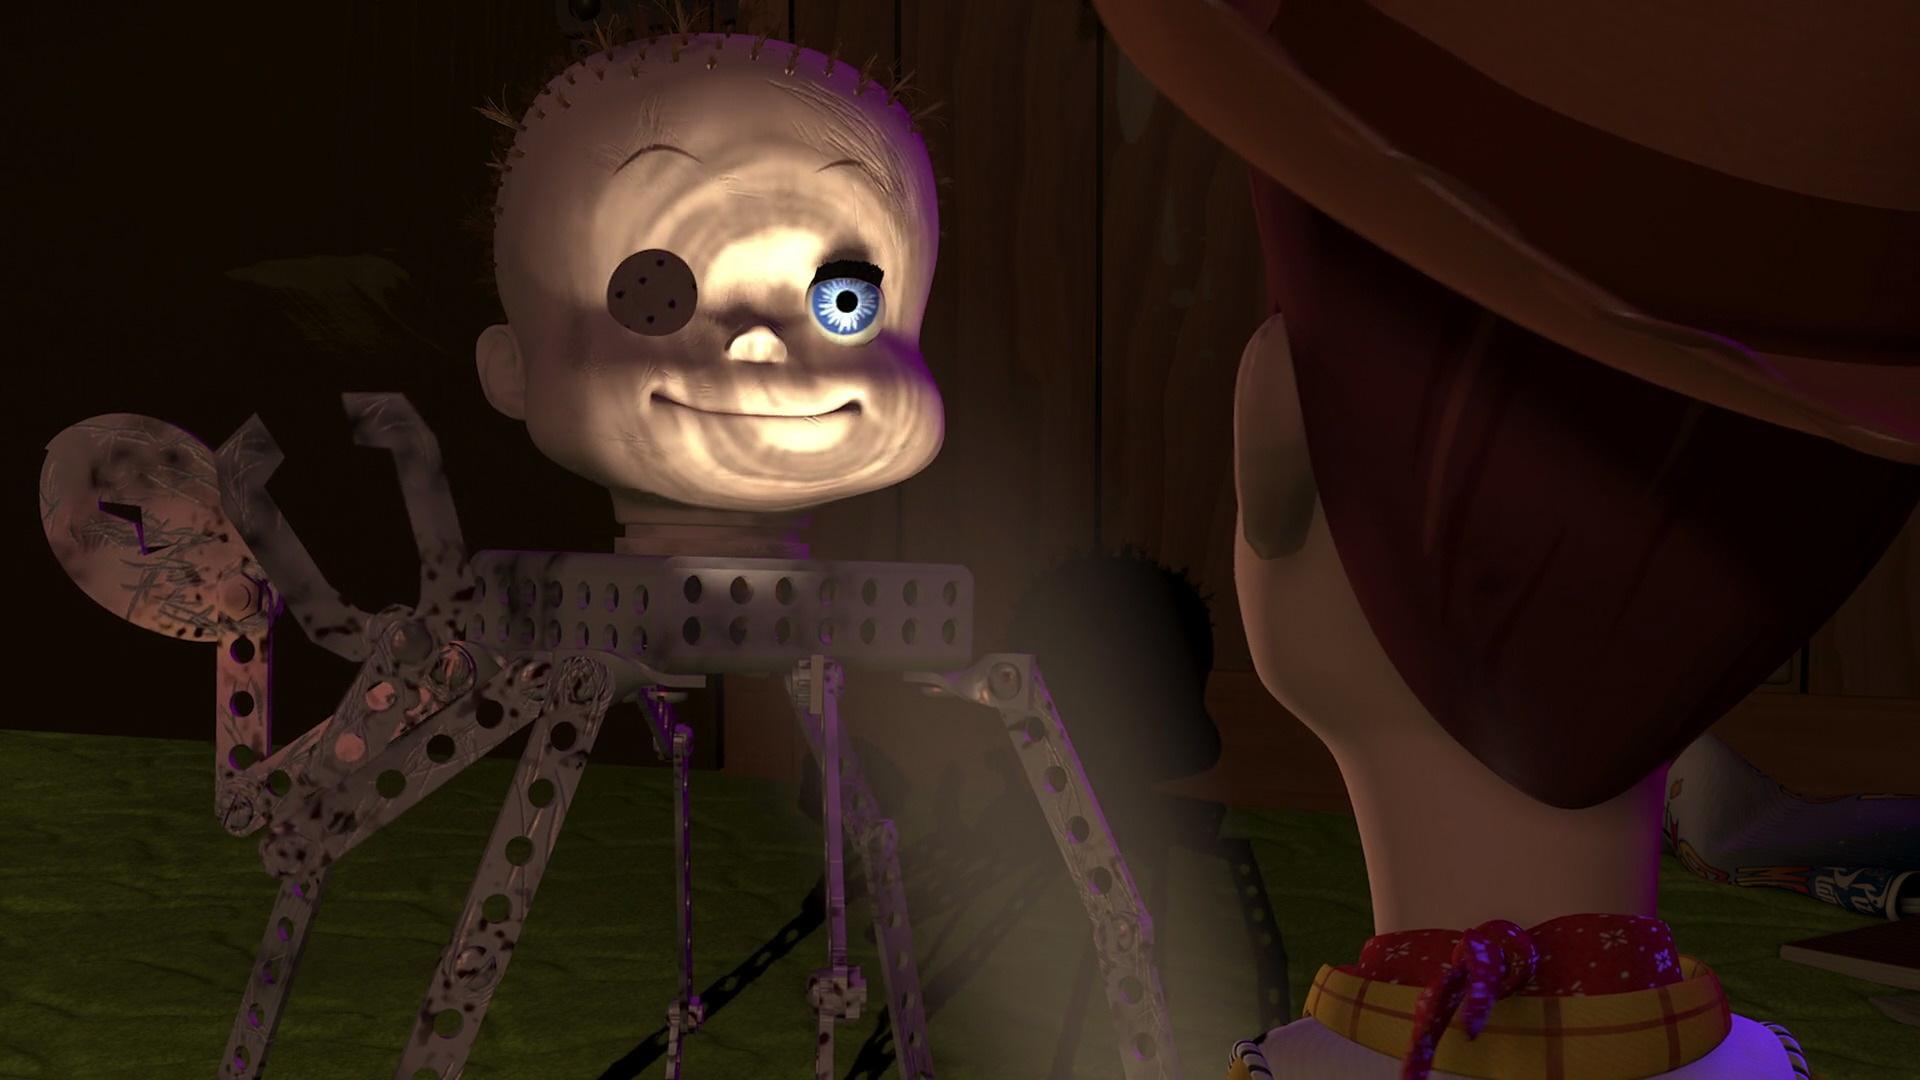 Tom Hanks in Toy Story (1995)